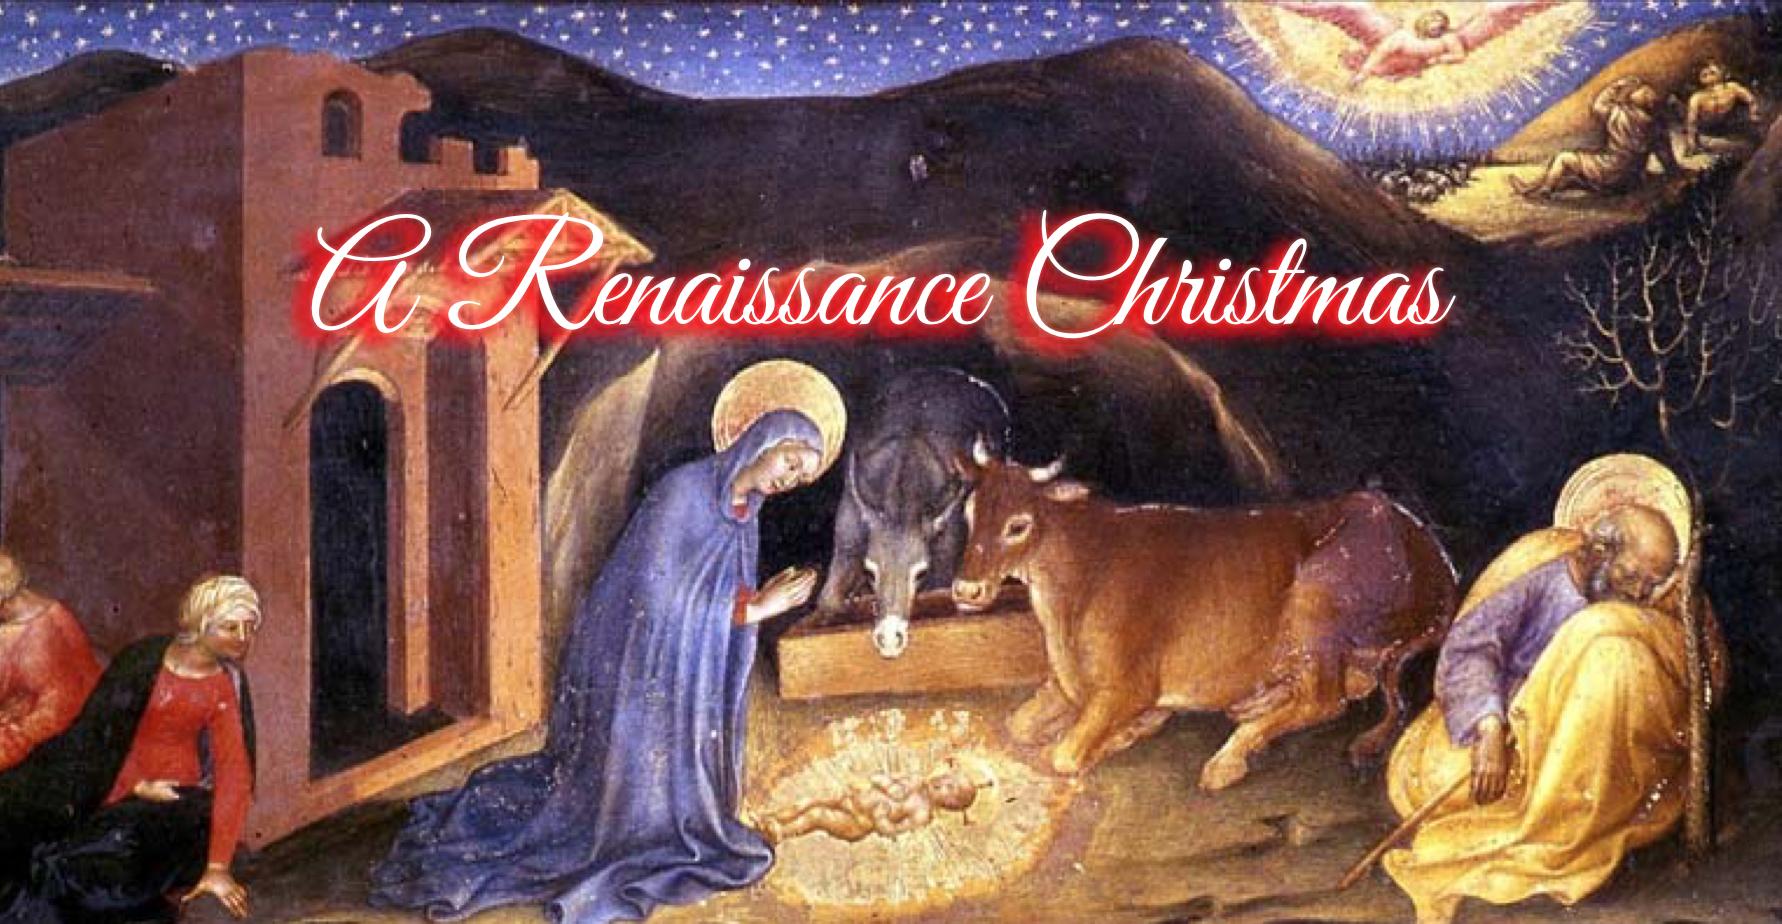 A Renaissance Christmas - Rocky Ruggiero Cultural Programs for the Arts